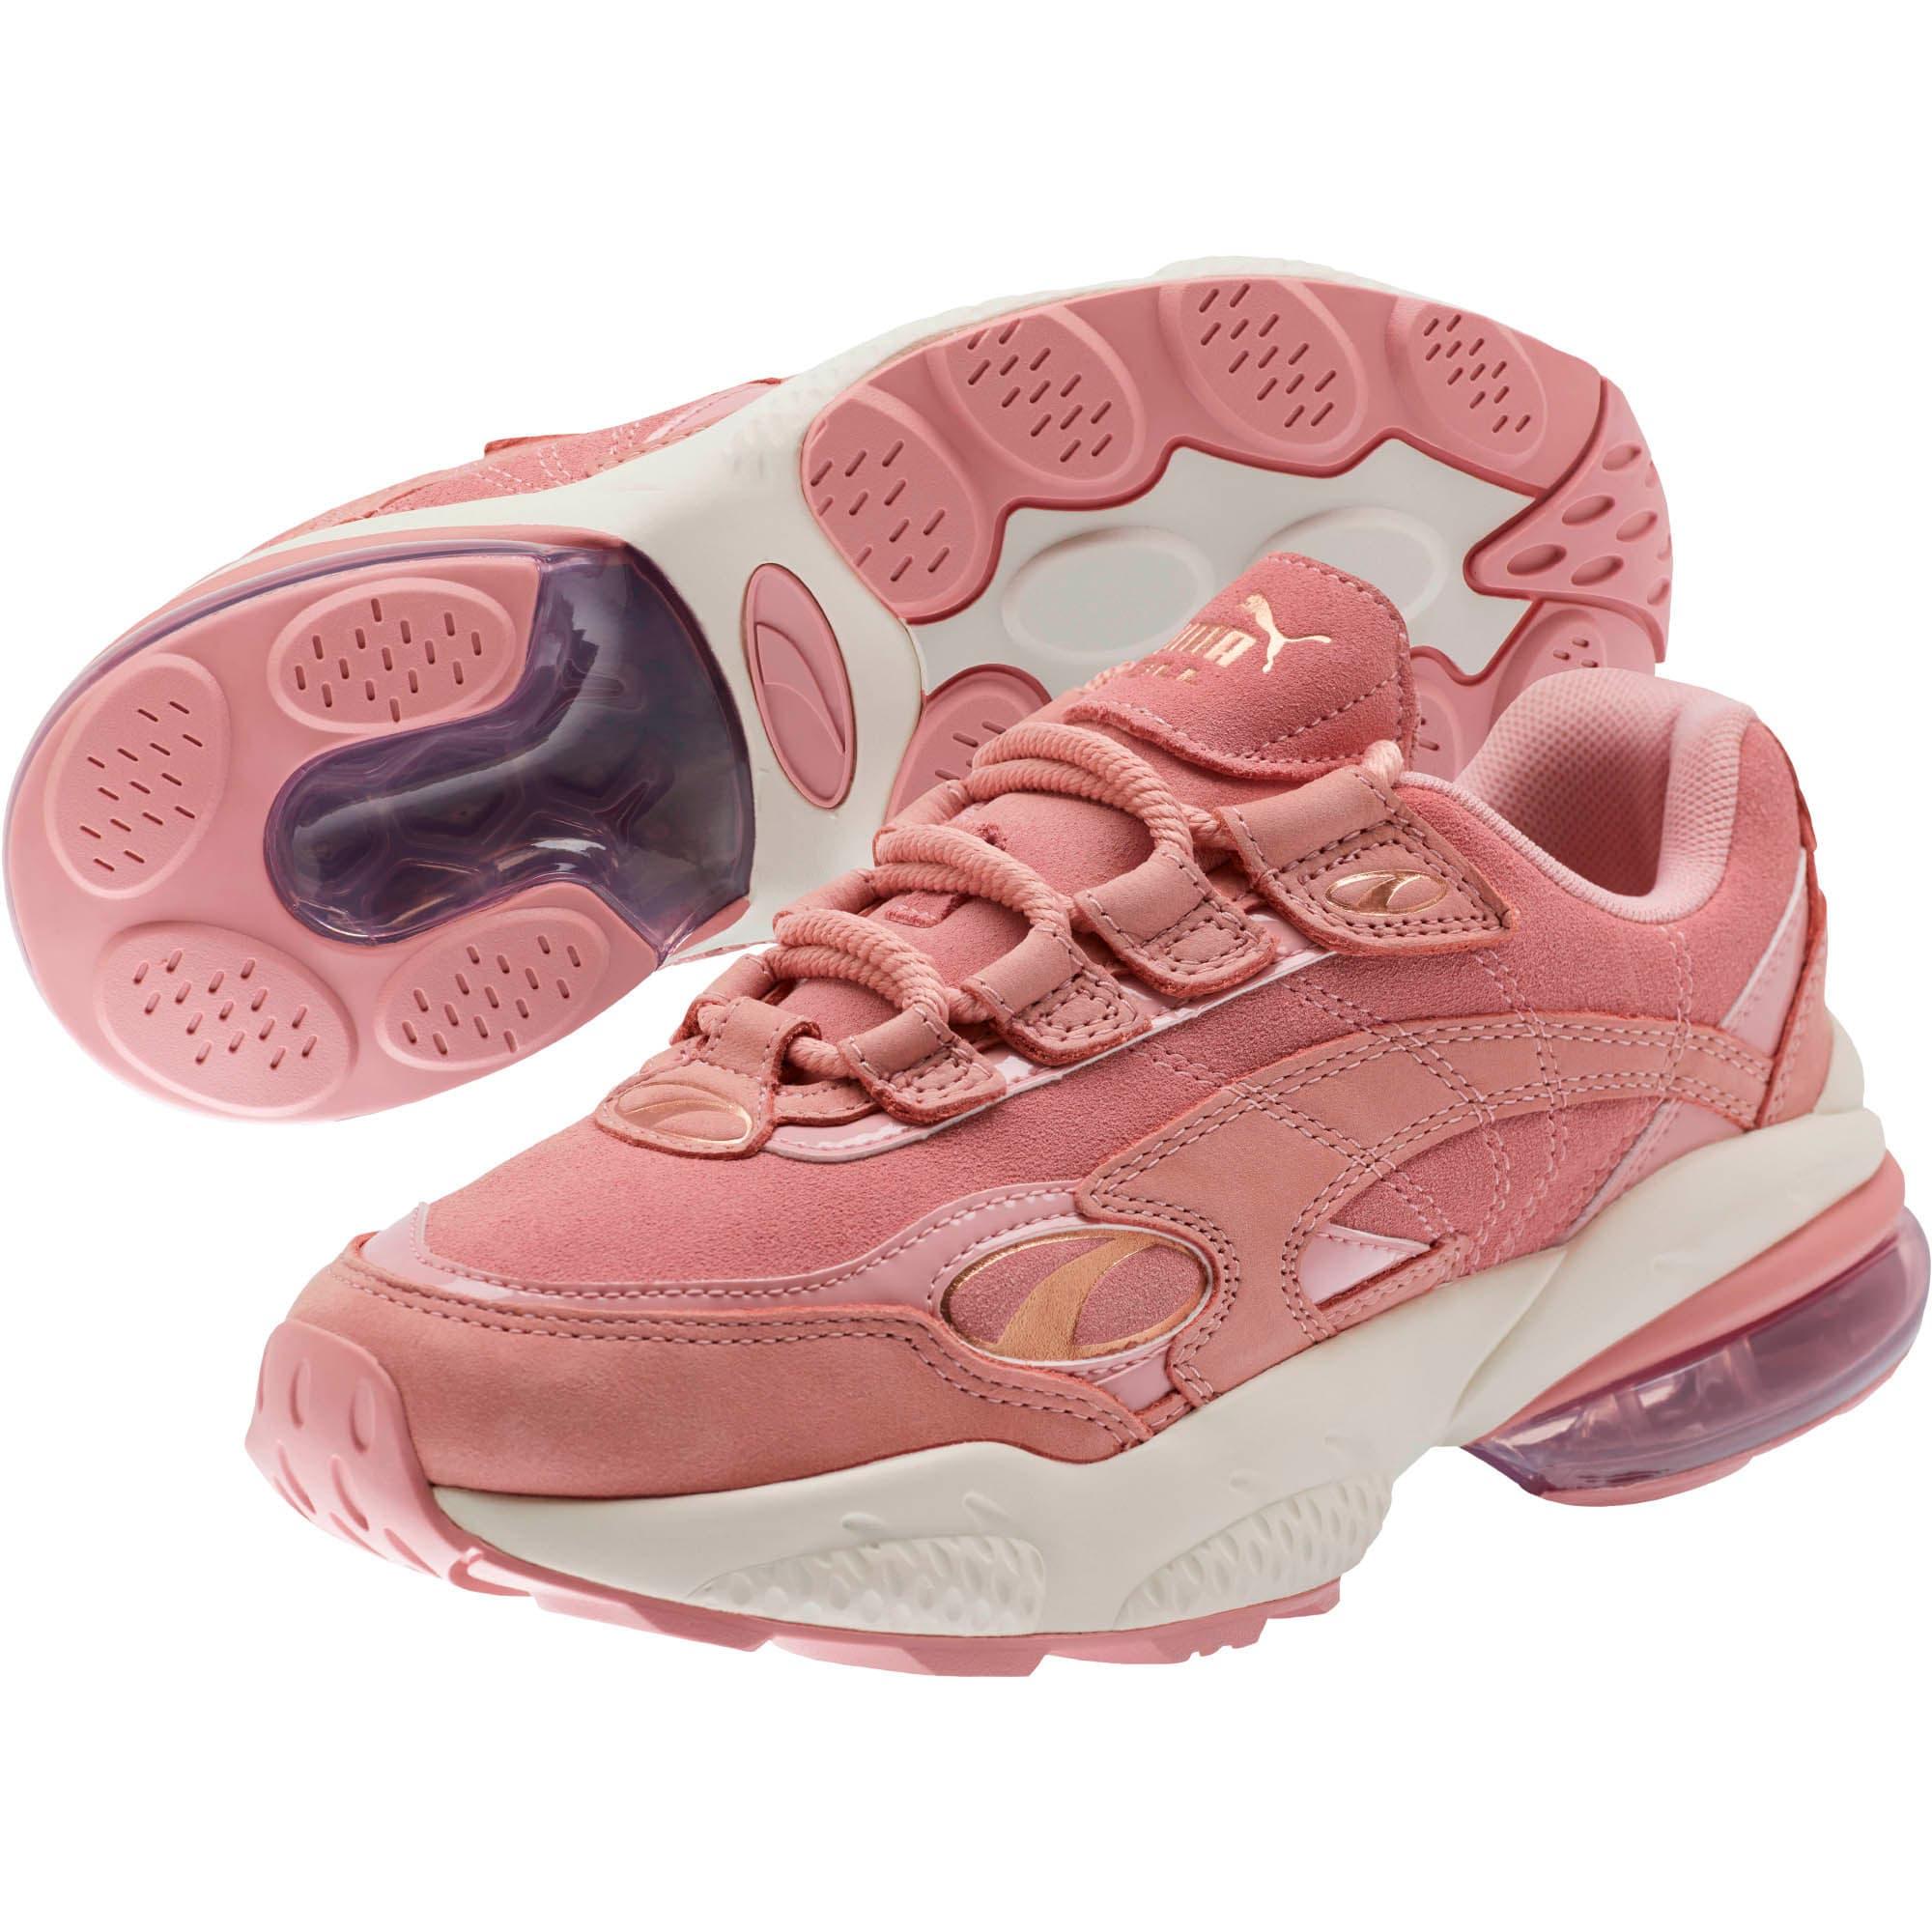 Thumbnail 2 of CELL Venom Patent Women's Sneakers, Bridal Rose-Marshmallow, medium